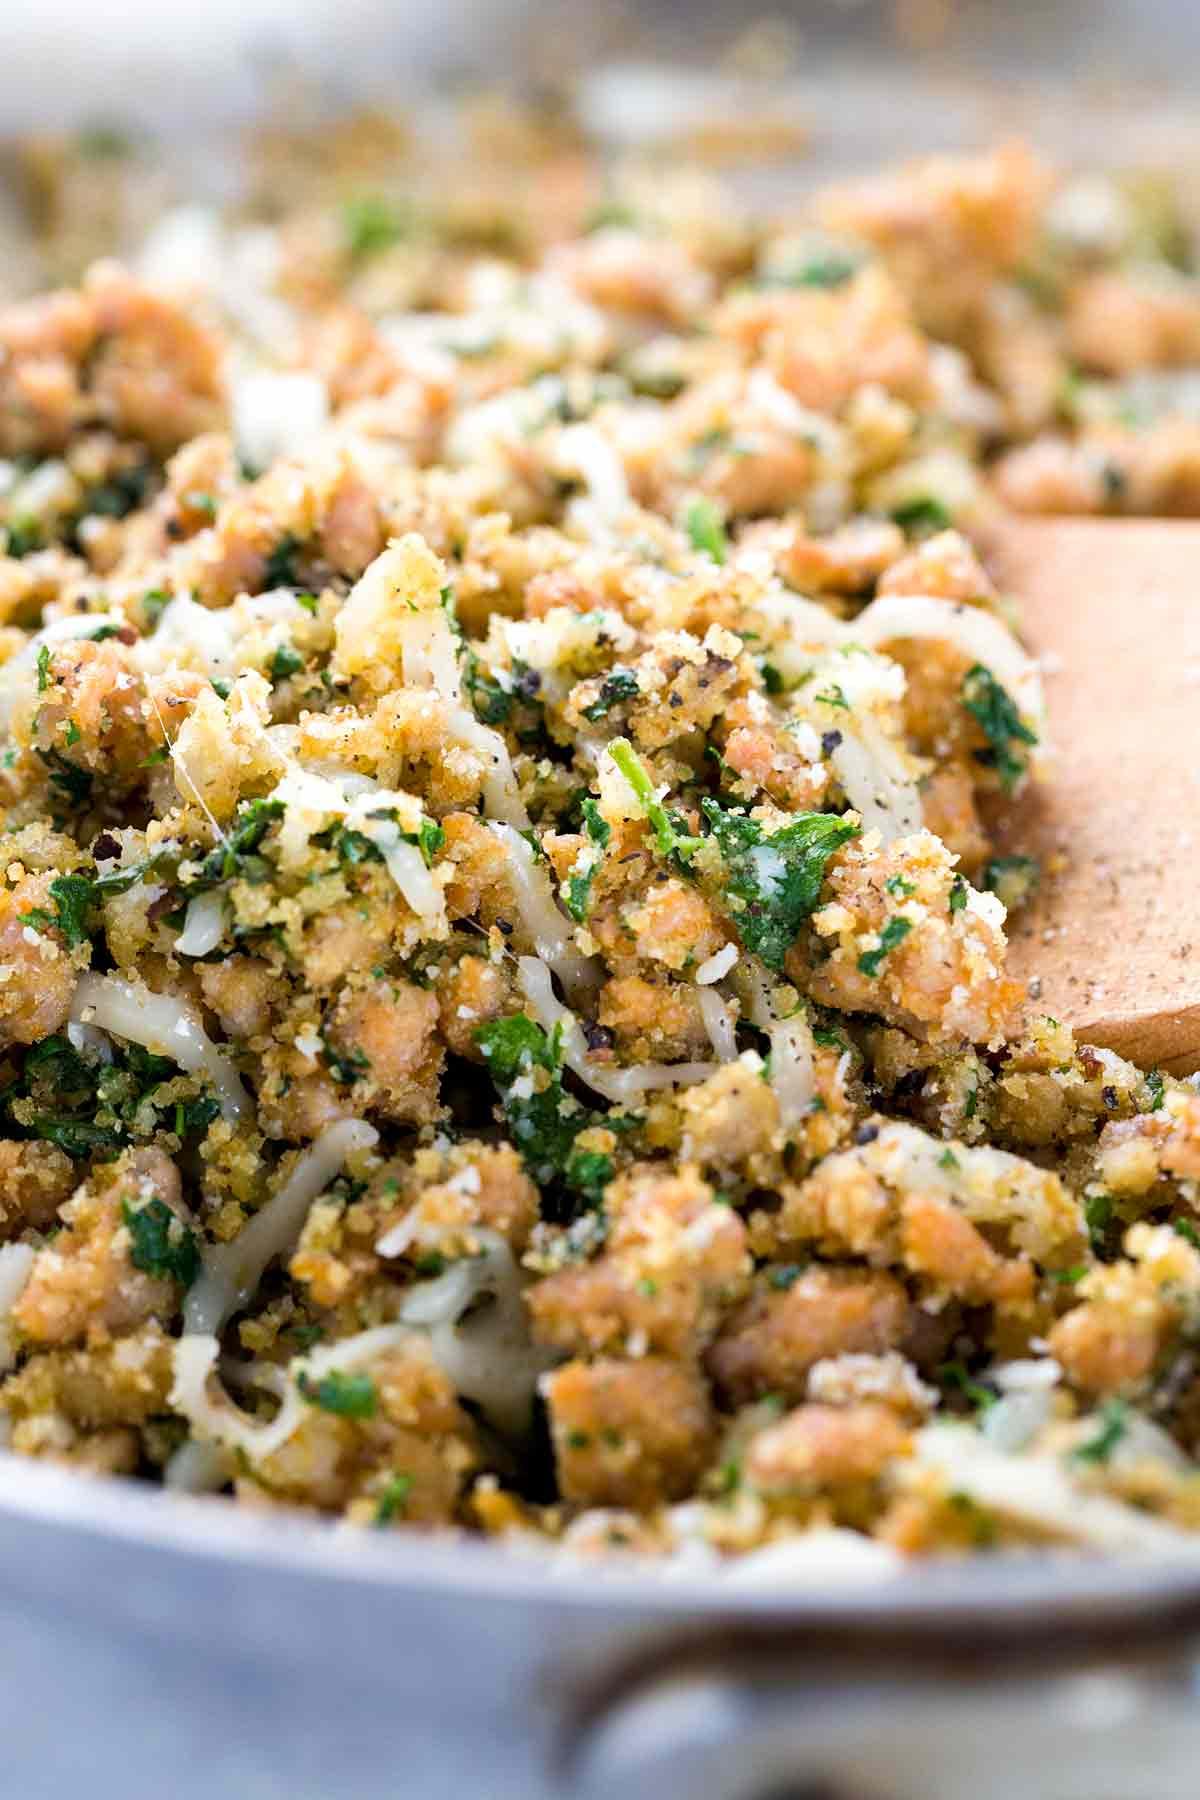 Stuffed Mushrooms garlic and Italian sausage breadcrumb mixture